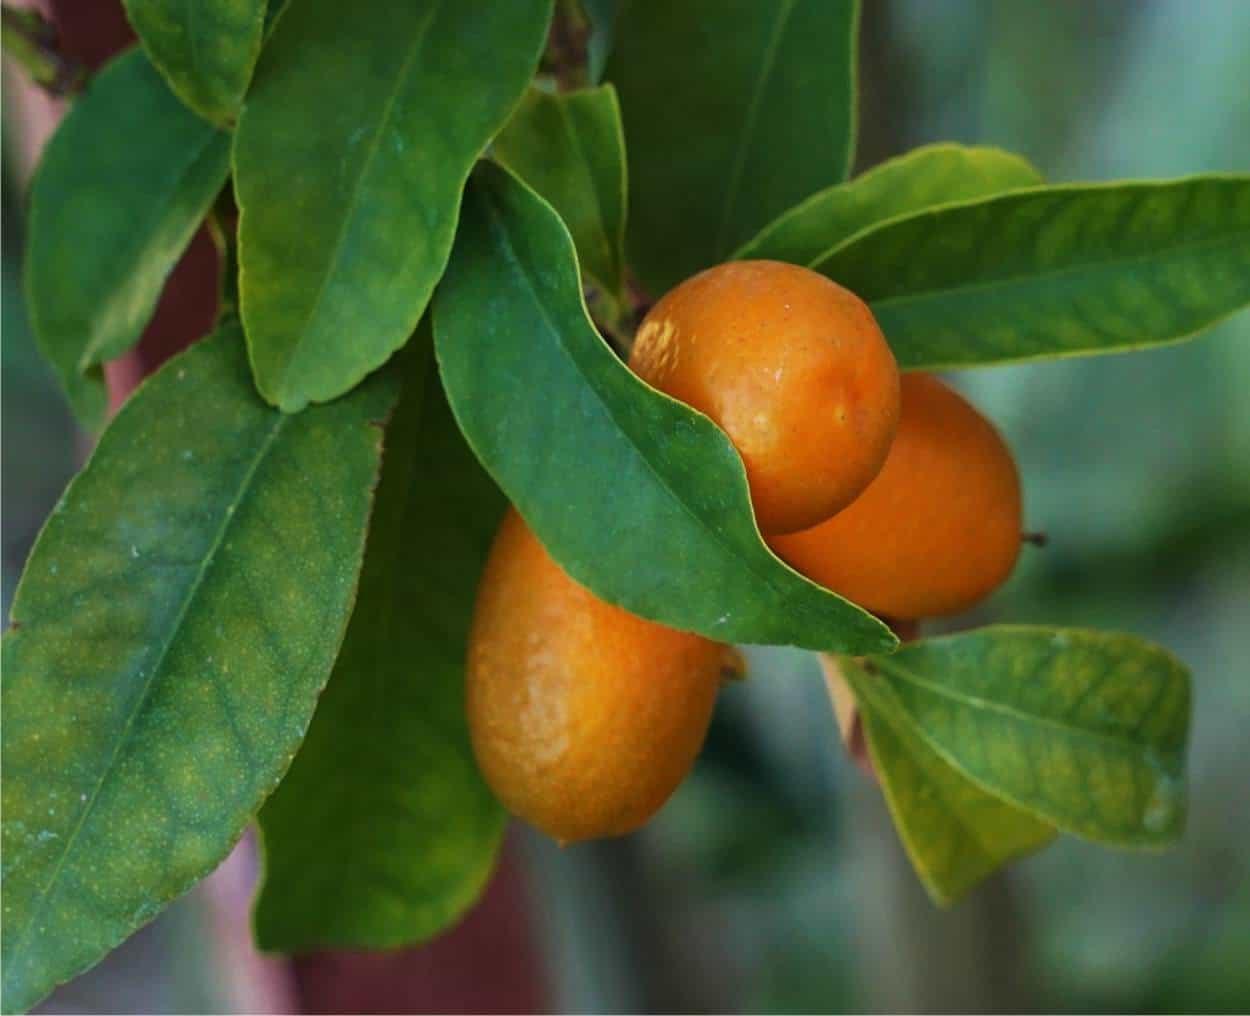 mandarini cinesi sulla pianta